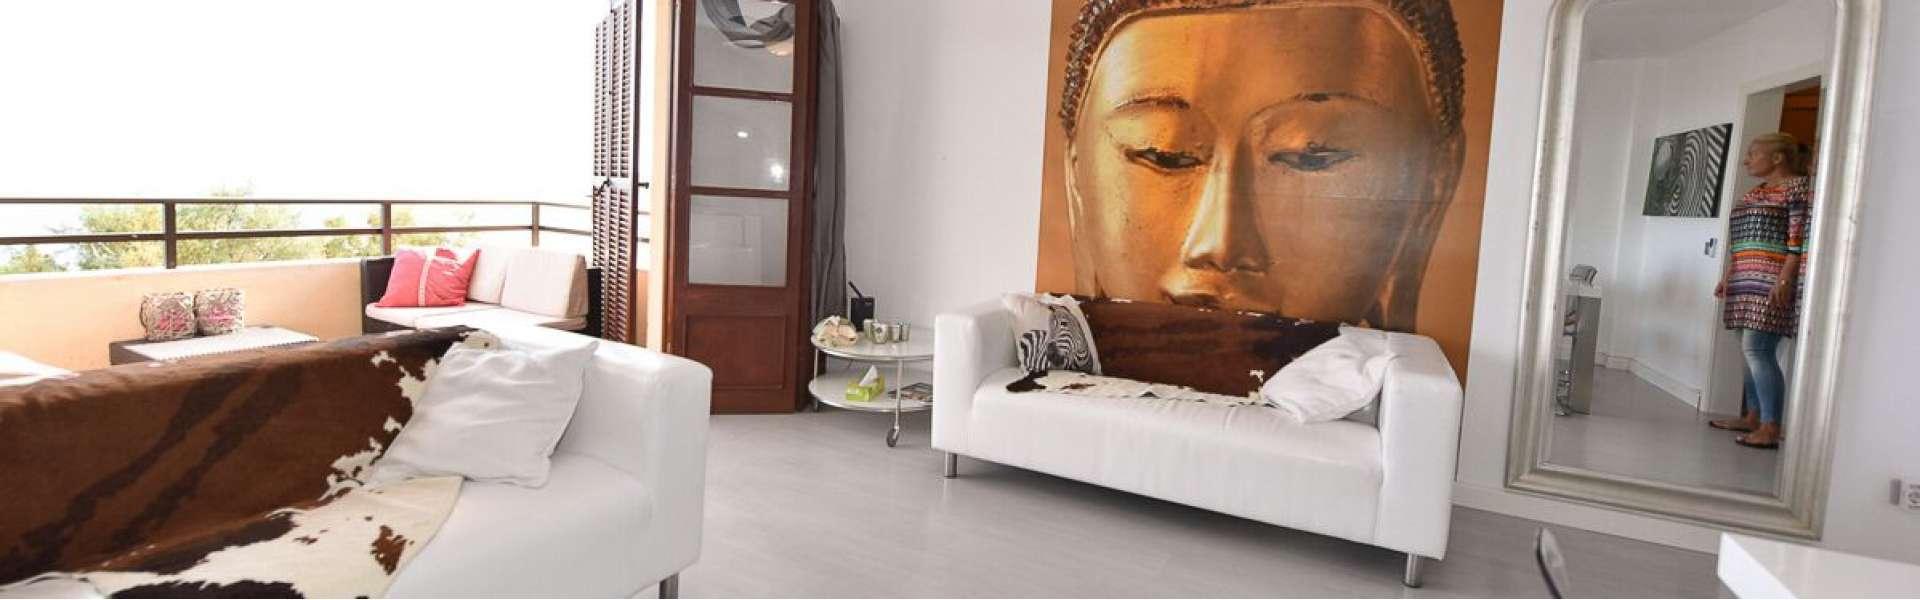 Charmante Wohnung in Erster Linie - Cala Bona